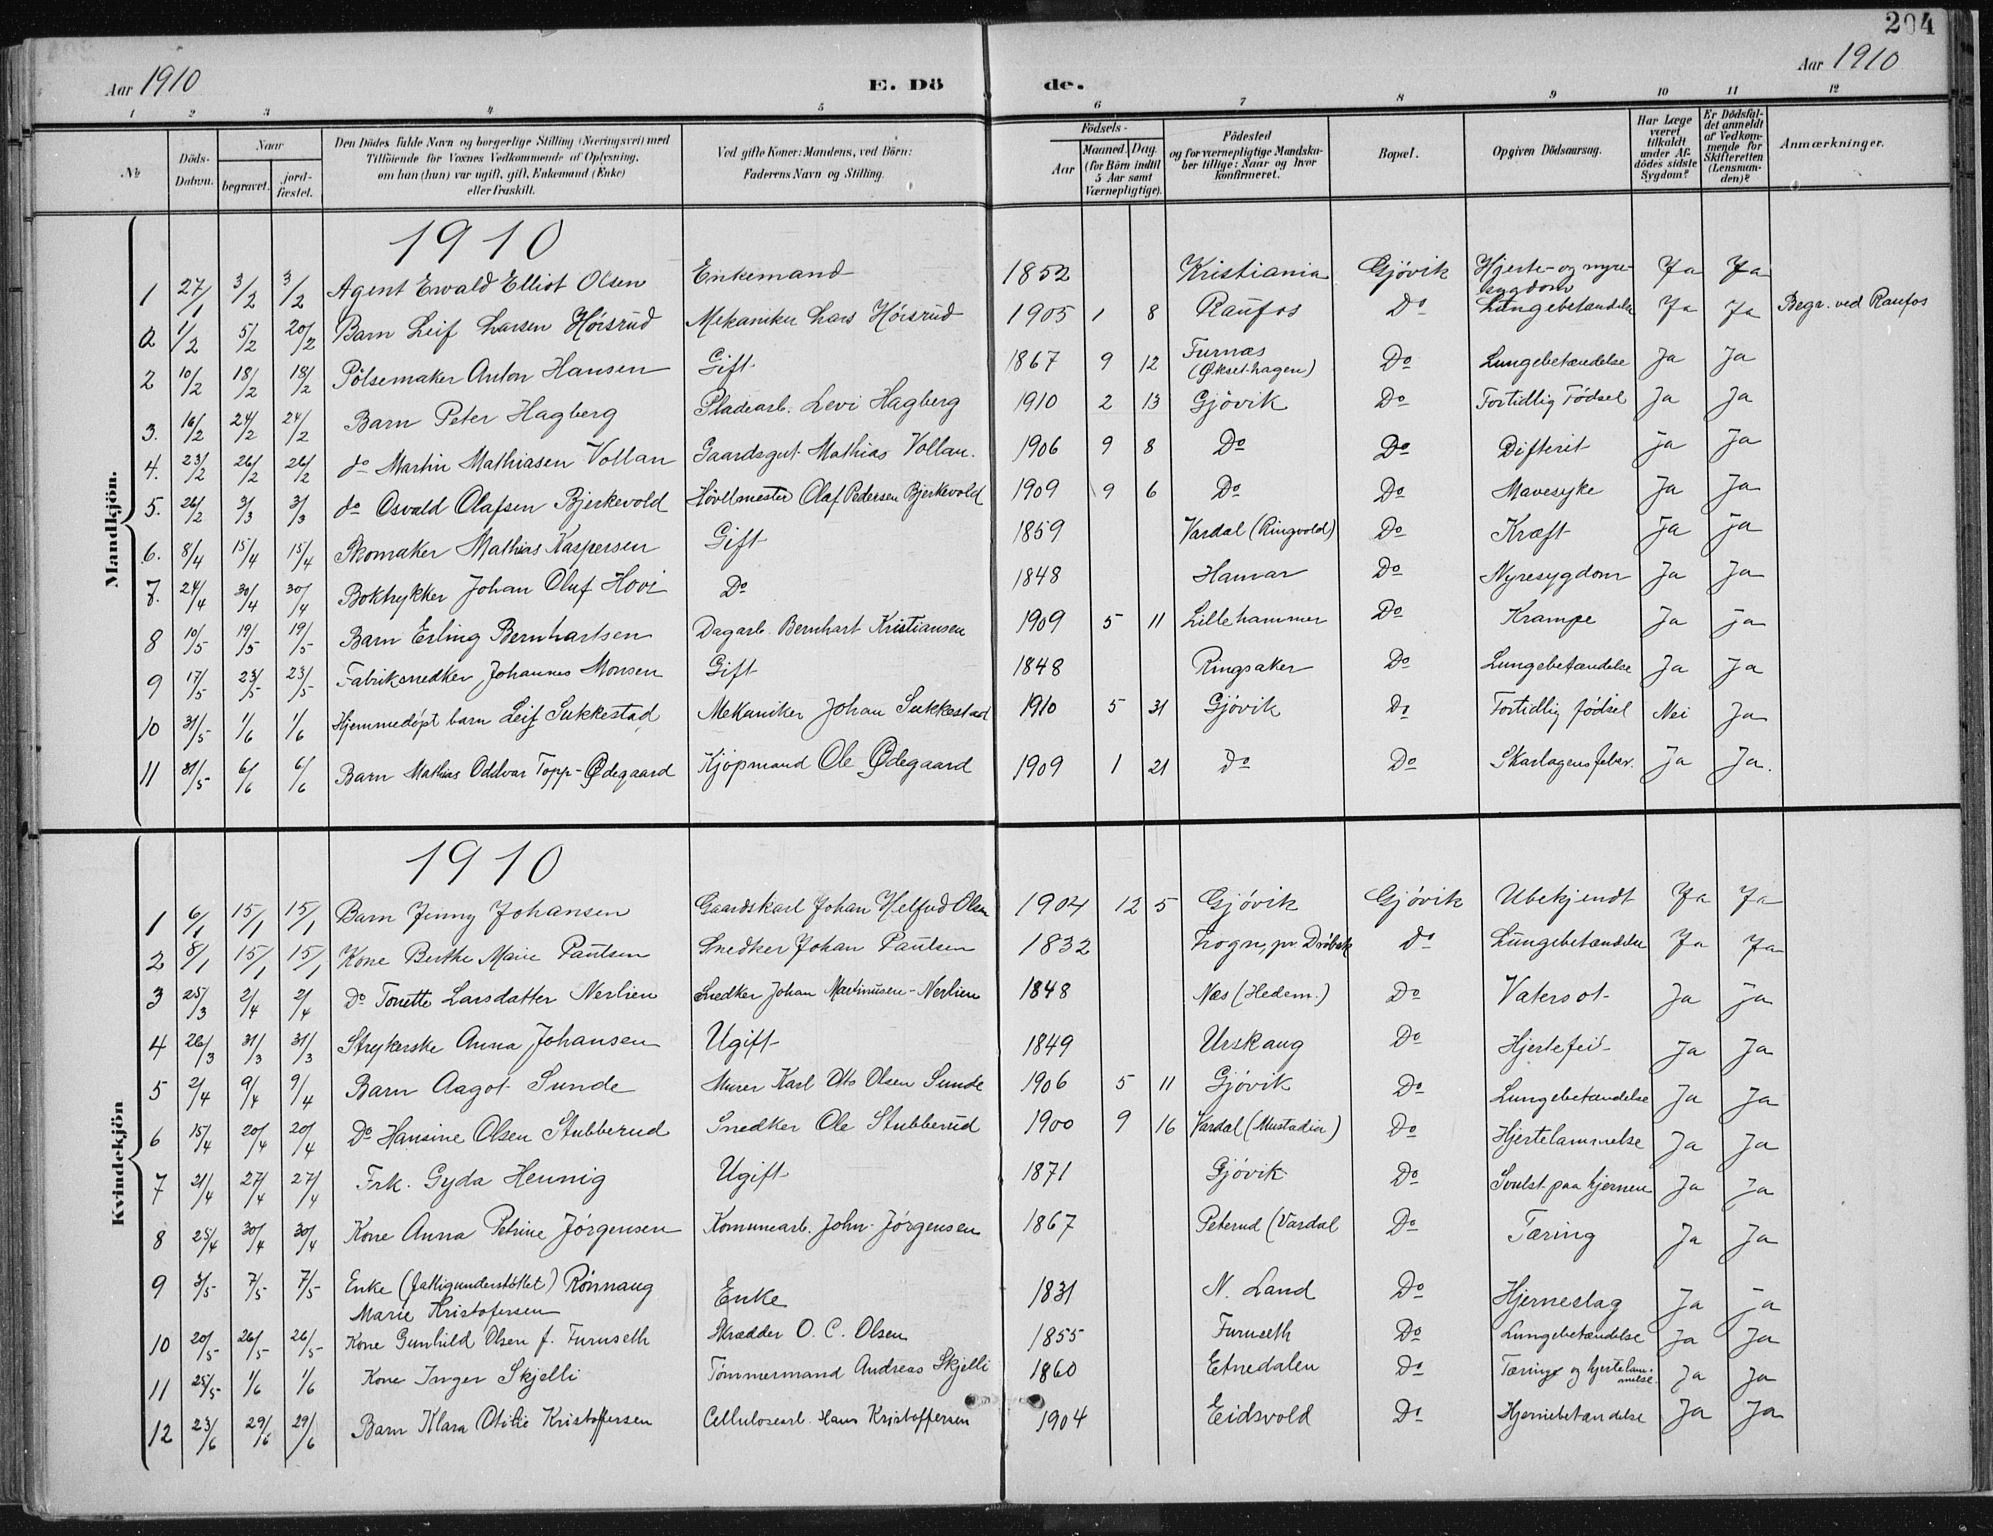 SAH, Vardal prestekontor, H/Ha/Haa/L0013: Ministerialbok nr. 13, 1901-1911, s. 204